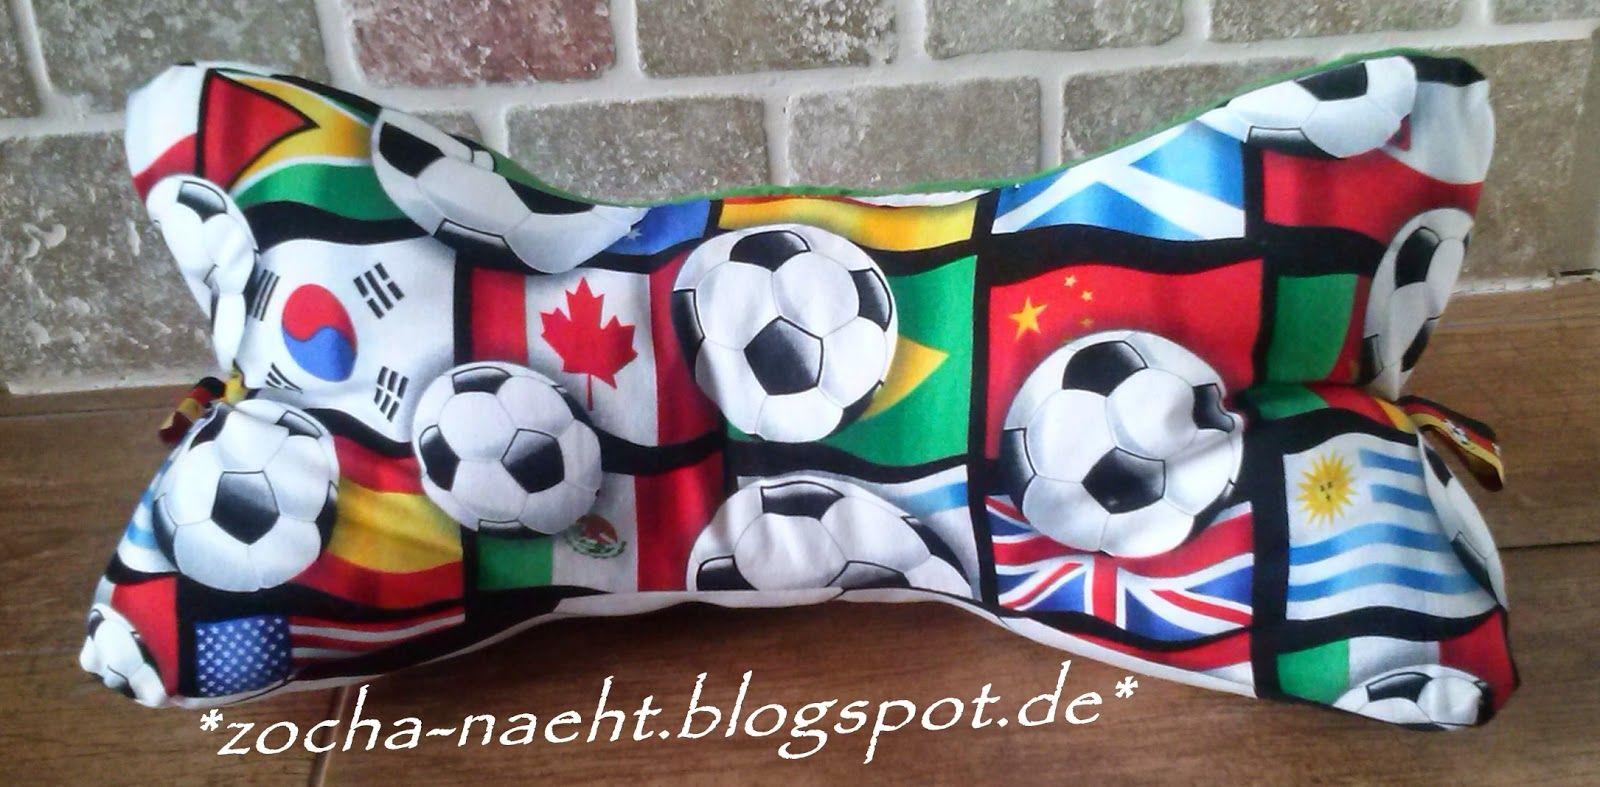 zocha näht: Fußball-Leseknochen